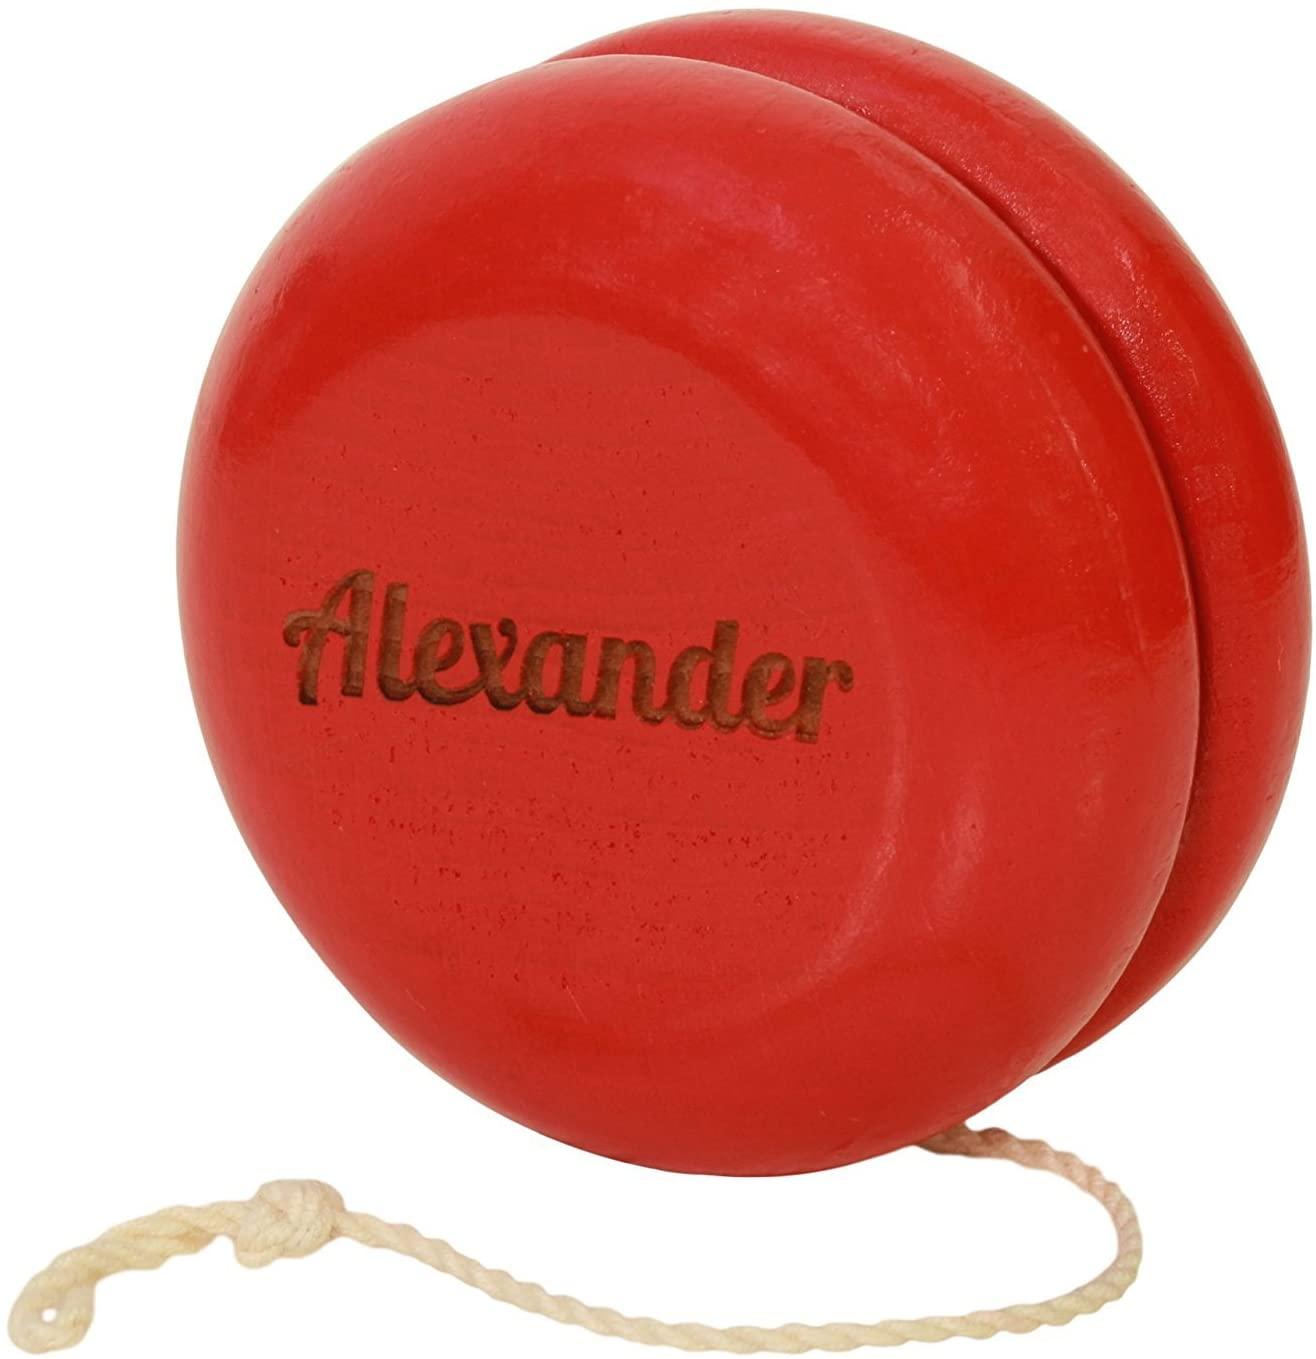 Yoyo King Customized Competition Classic Red Wooden Yo-yo